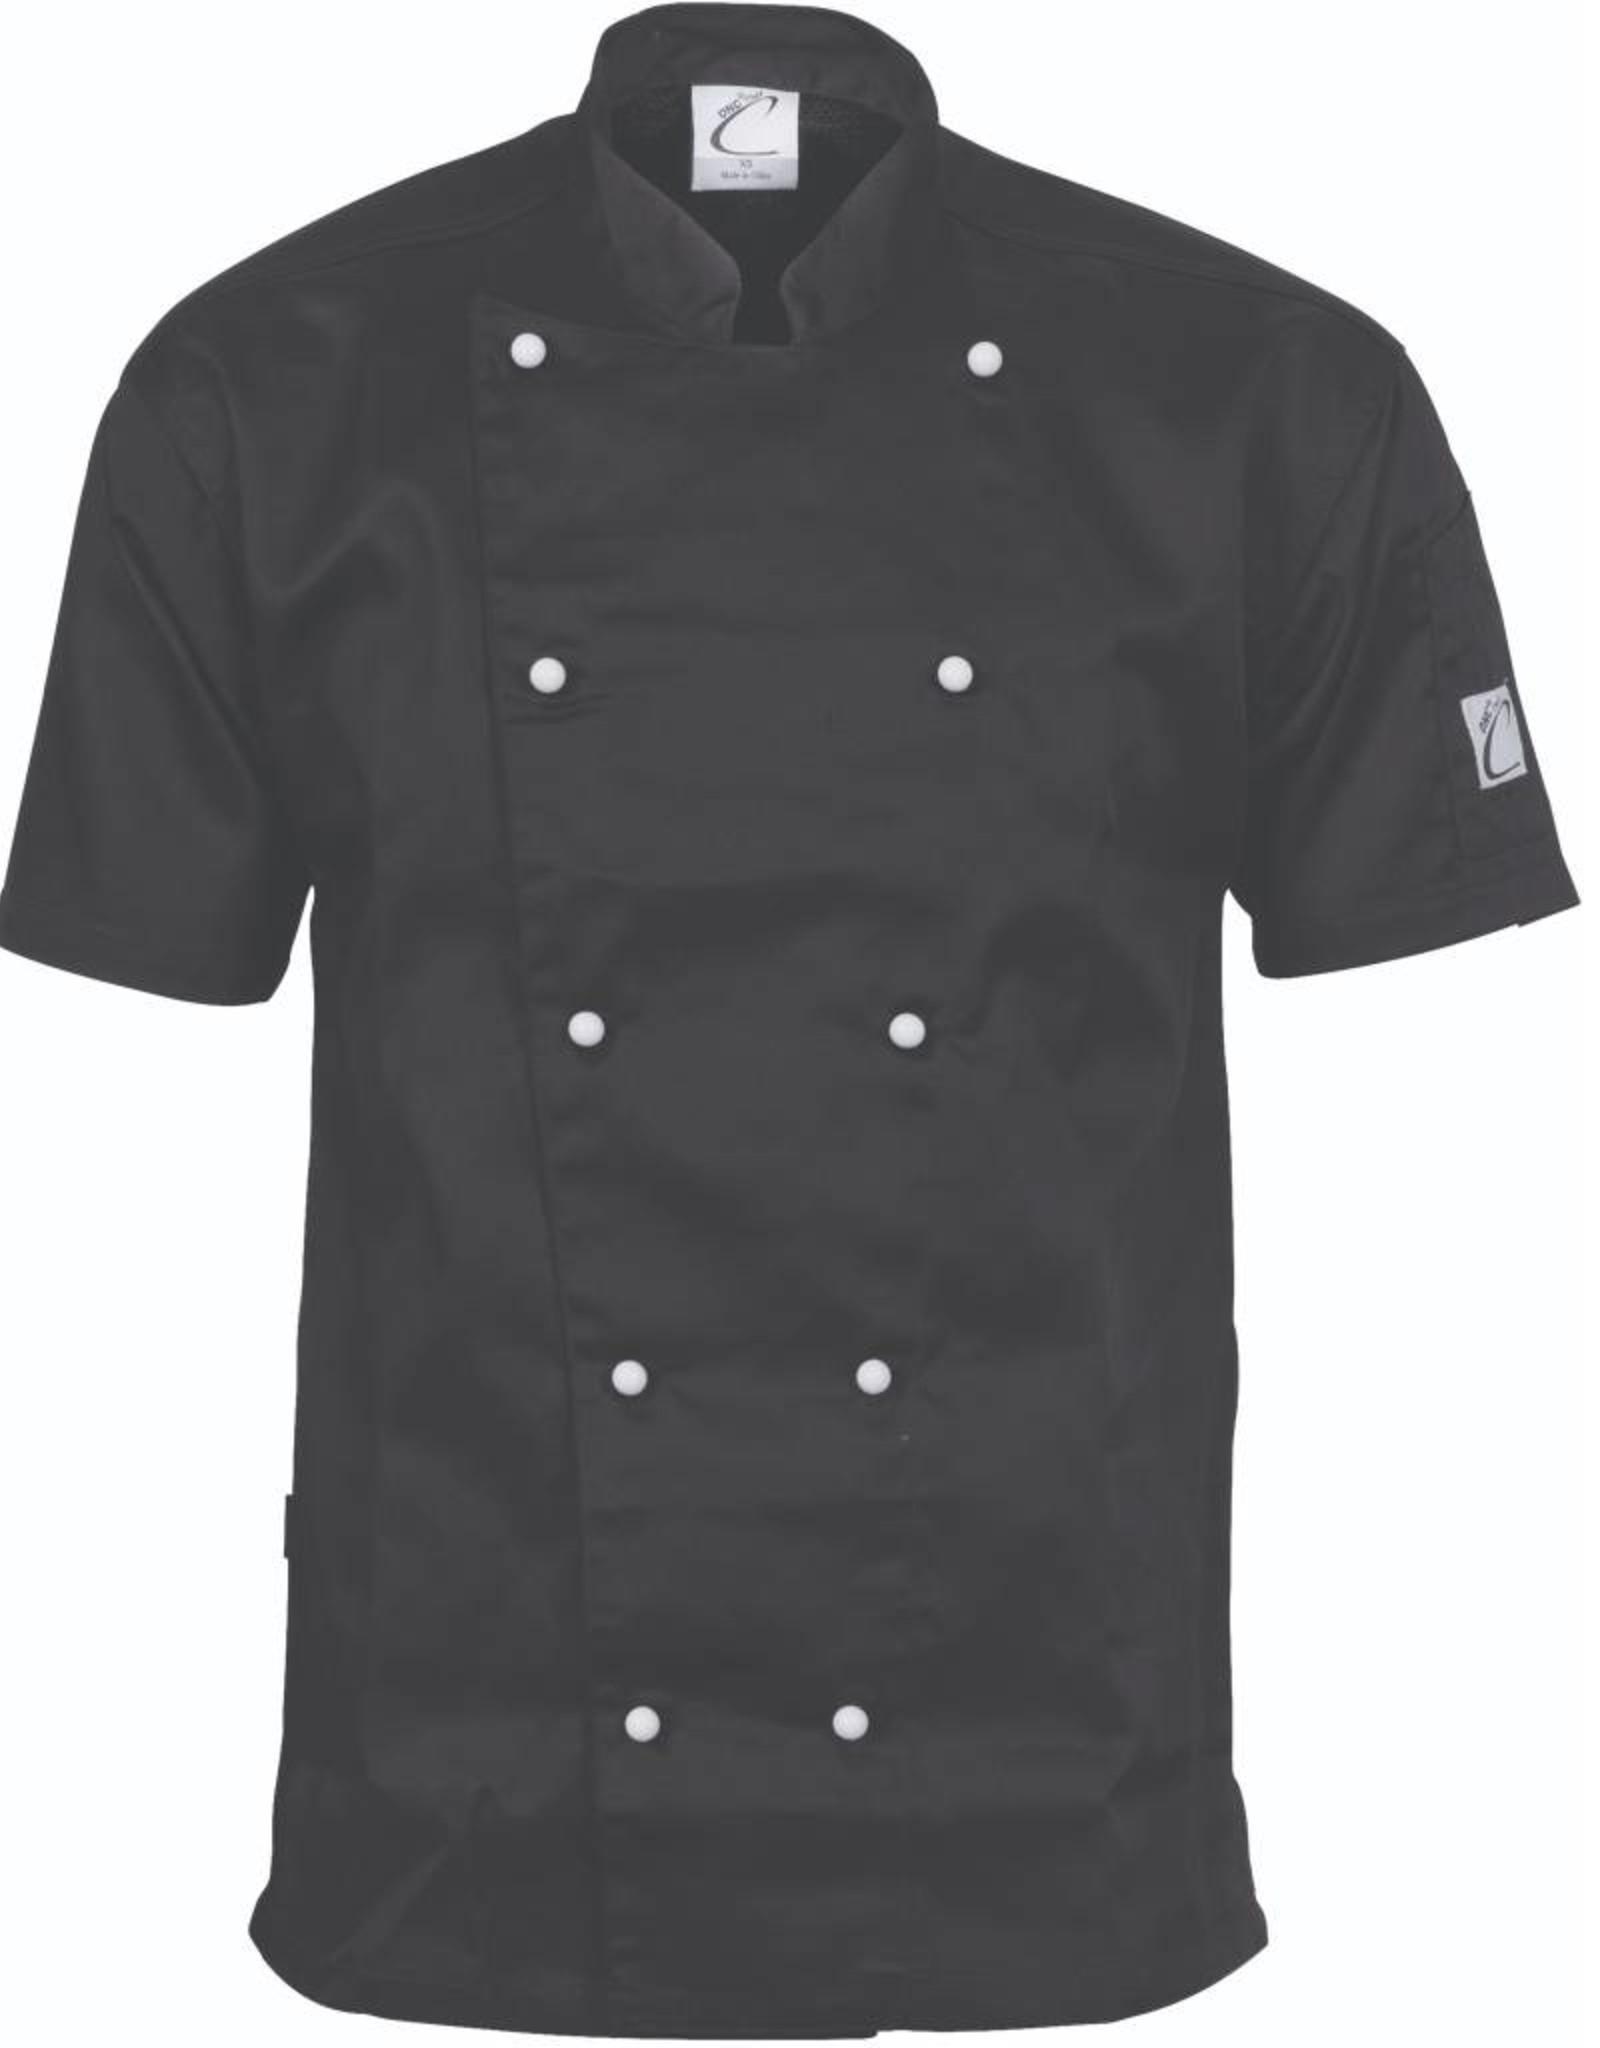 DNC Workwear DNC 1101 Traditional Short Sleeve Chefs Jacket